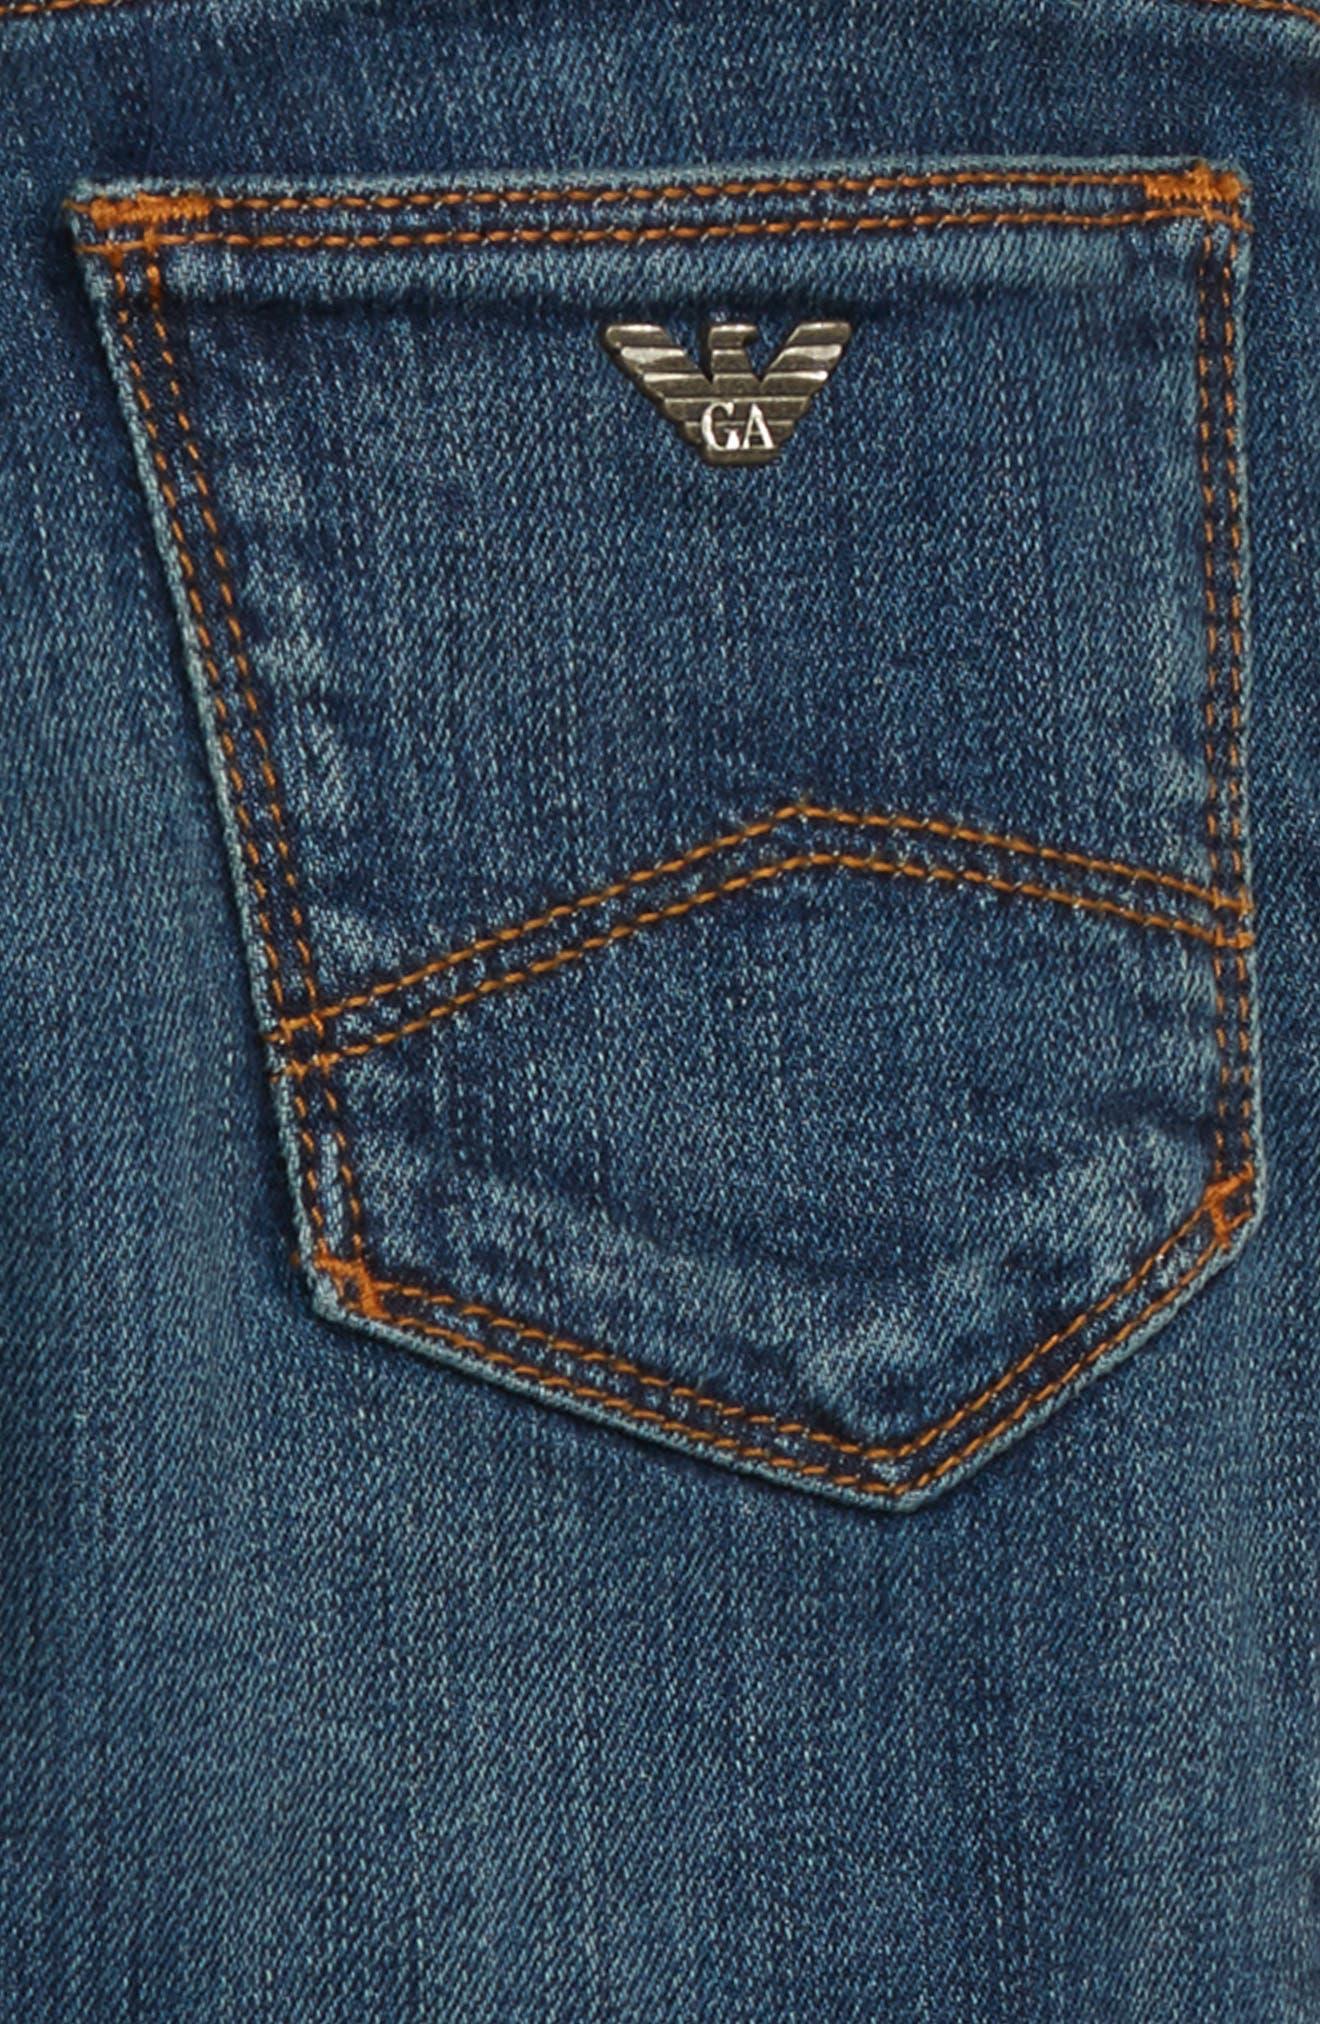 ARMANI JUNIOR,                             Denim Jeans,                             Alternate thumbnail 3, color,                             SOLID DARK BLUE